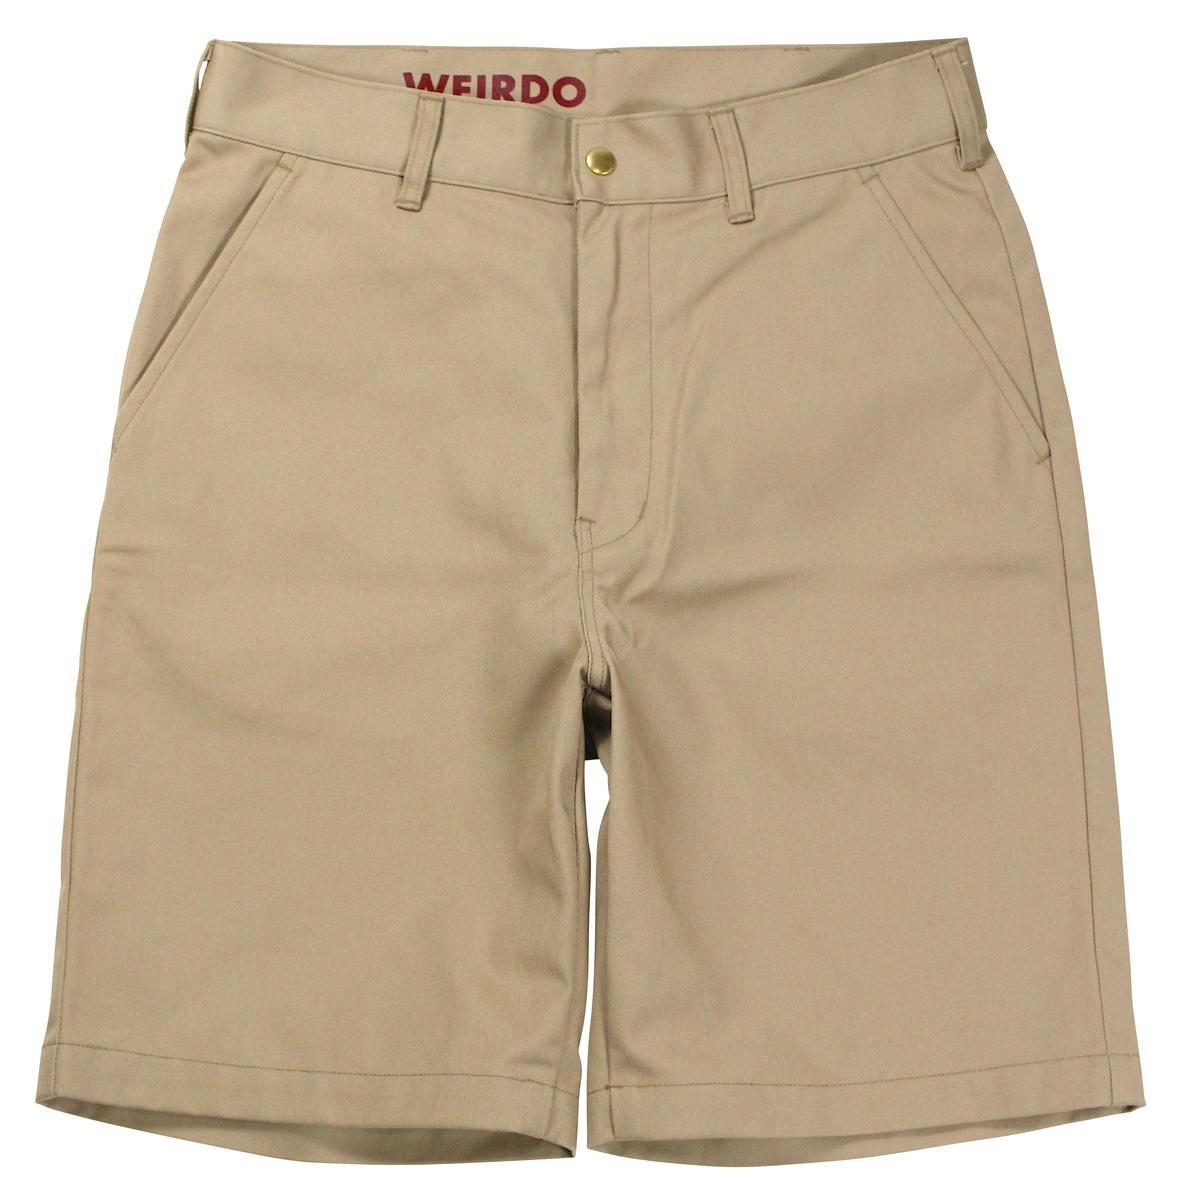 WEIRDO [-W & L UP - SHORTS- BEIGE size.30,32,34,36]